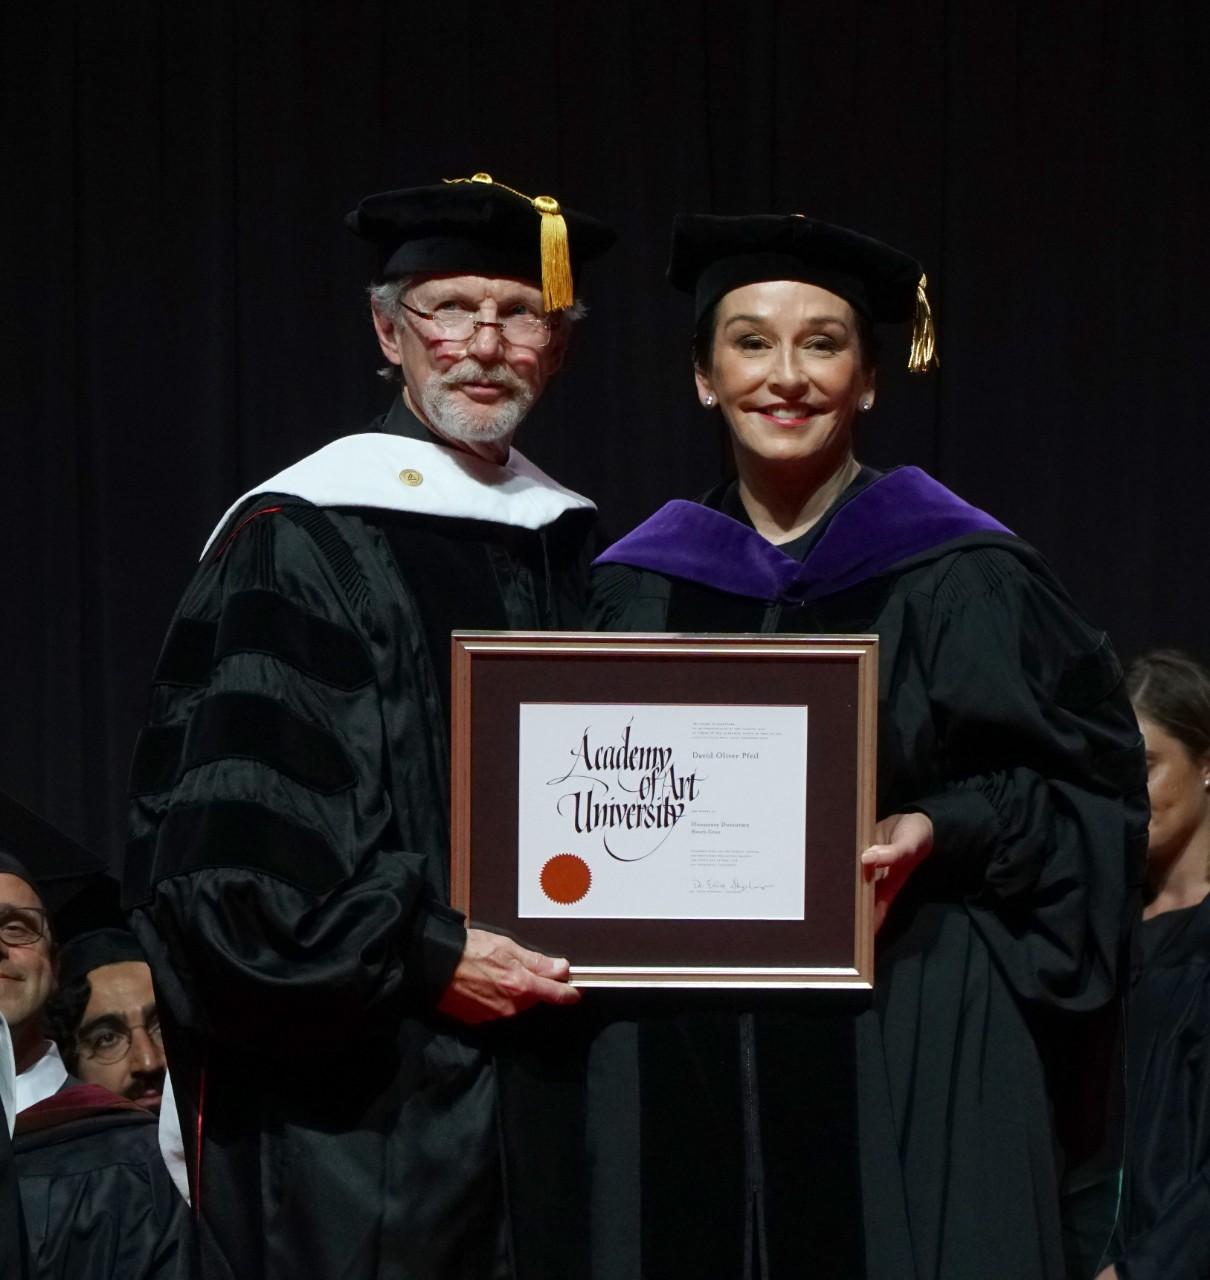 2018 Honorary Doctorate Recipient: David Pfeil- Academy of Art University